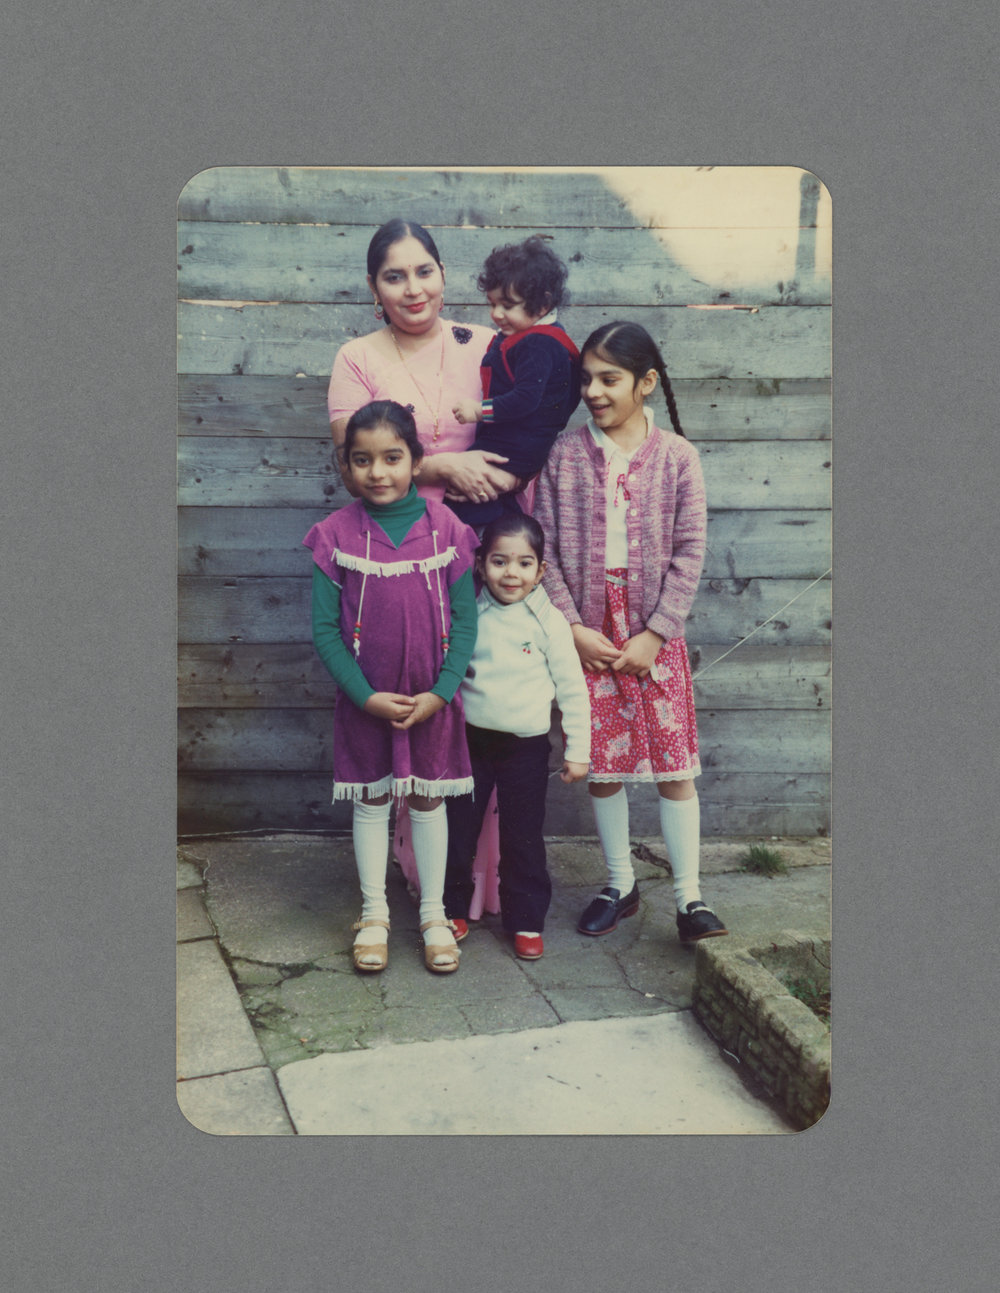 Windsor Rd. c.1982